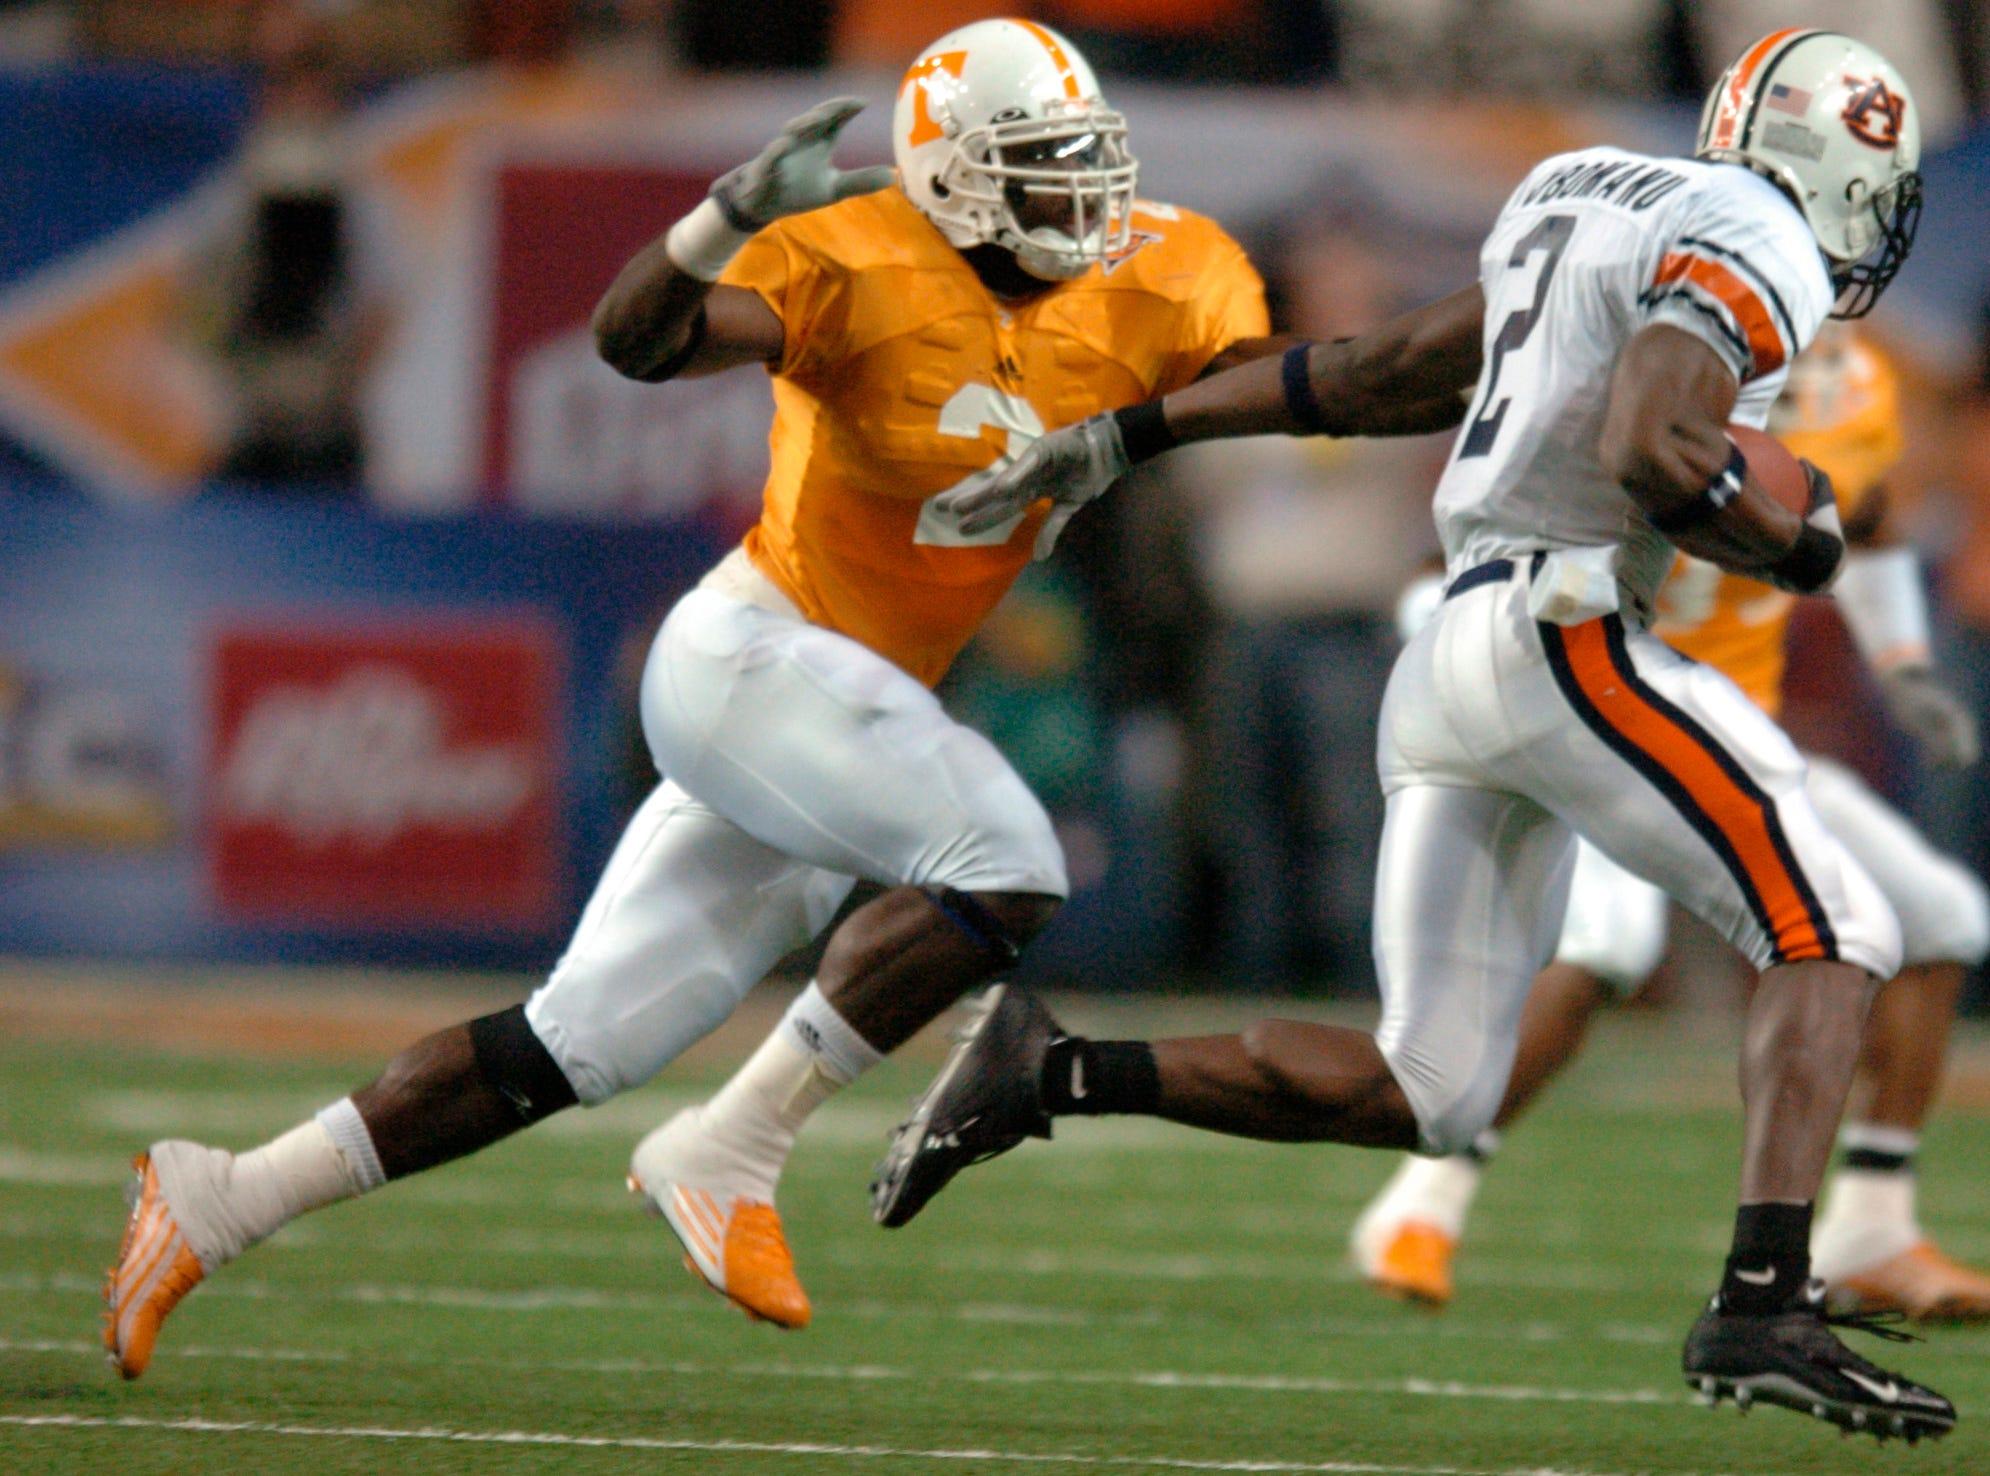 UT's Kevin Burnett (2) chases Auburn's Ben Obomanu (2) during the SEC Championship Game in the Georgia Dome Saturday night in Atlanta in 2004.